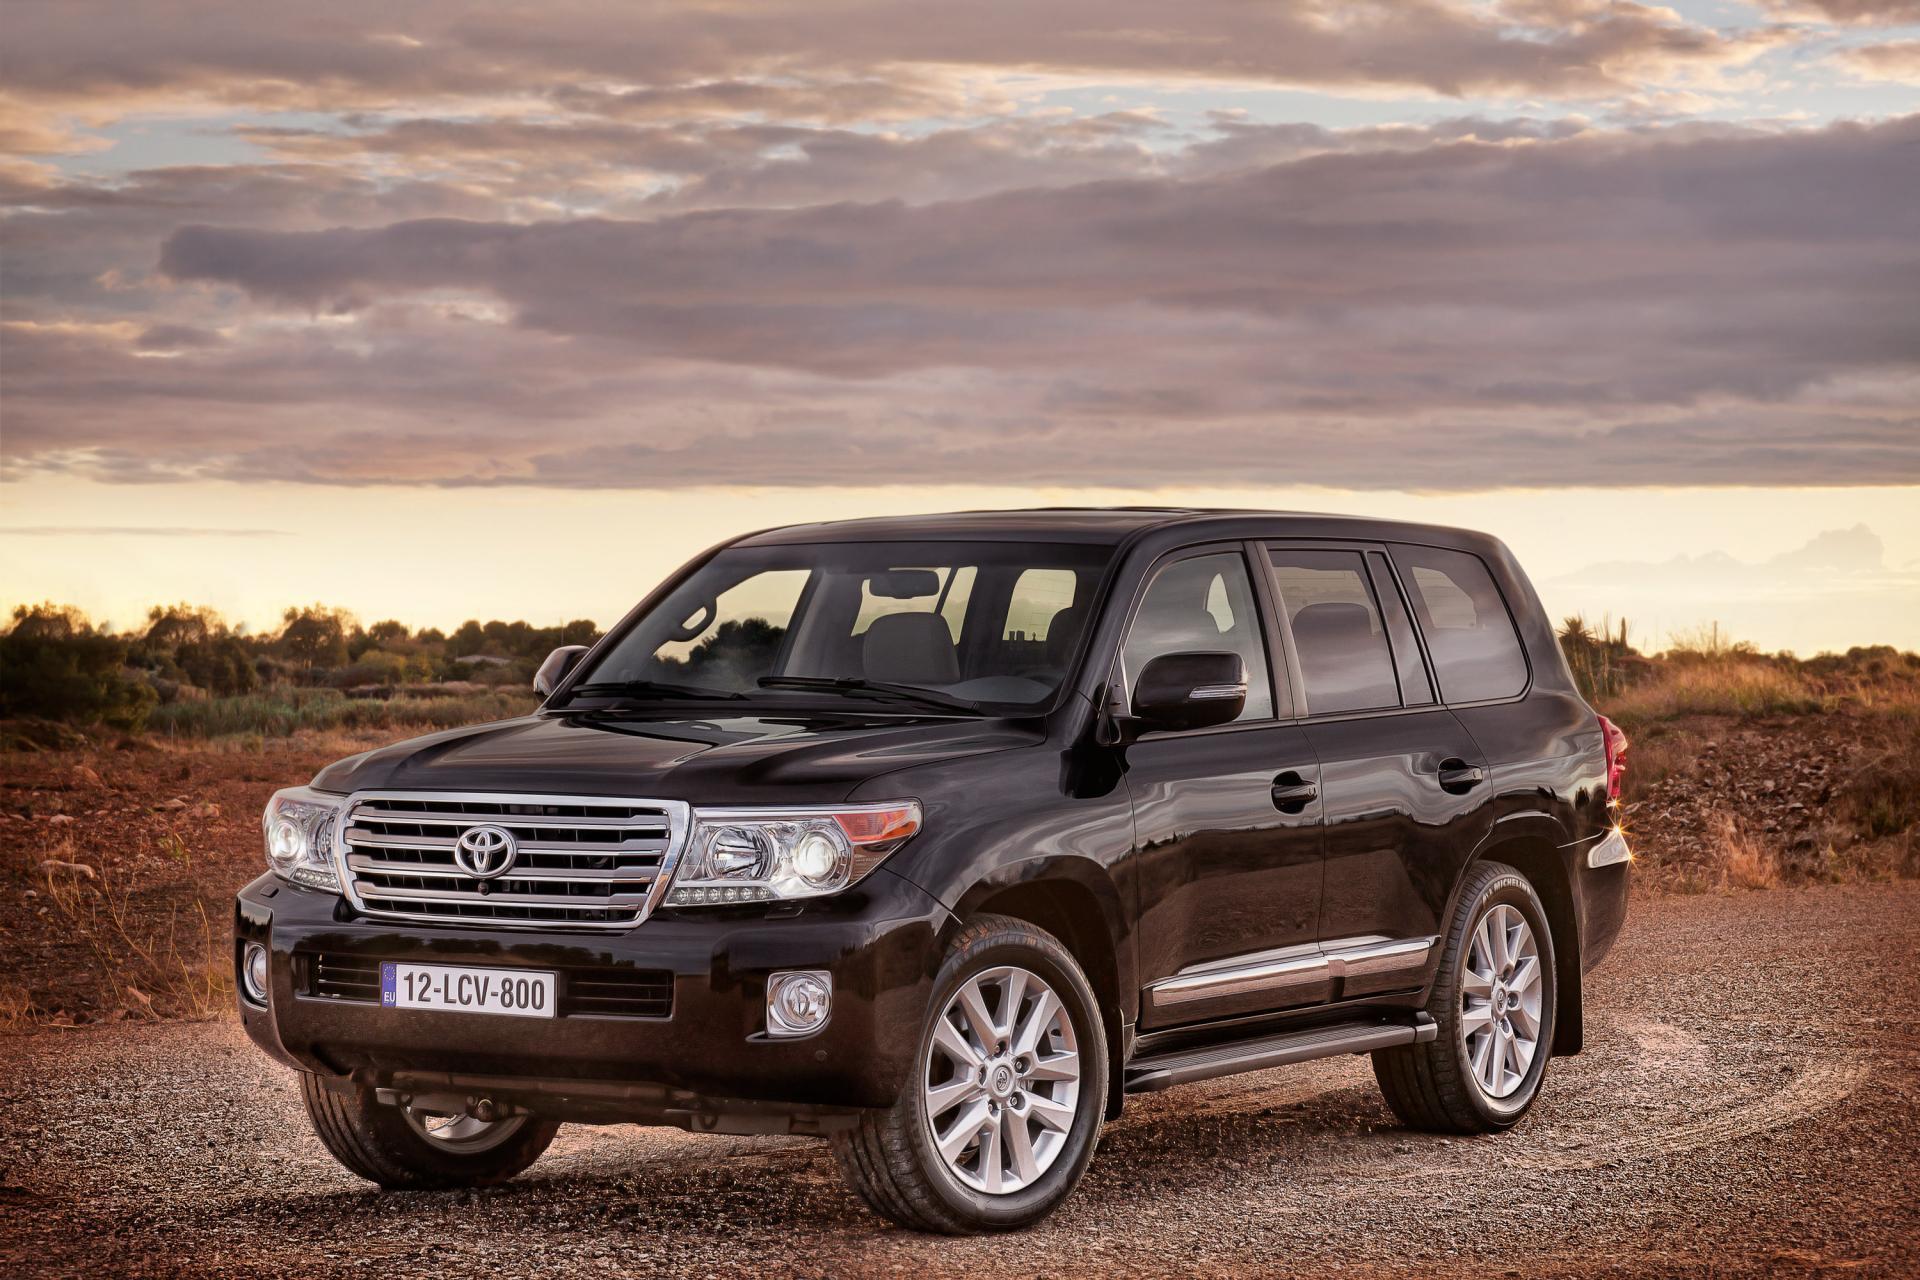 2013 Toyota Land Cruiser News And Information